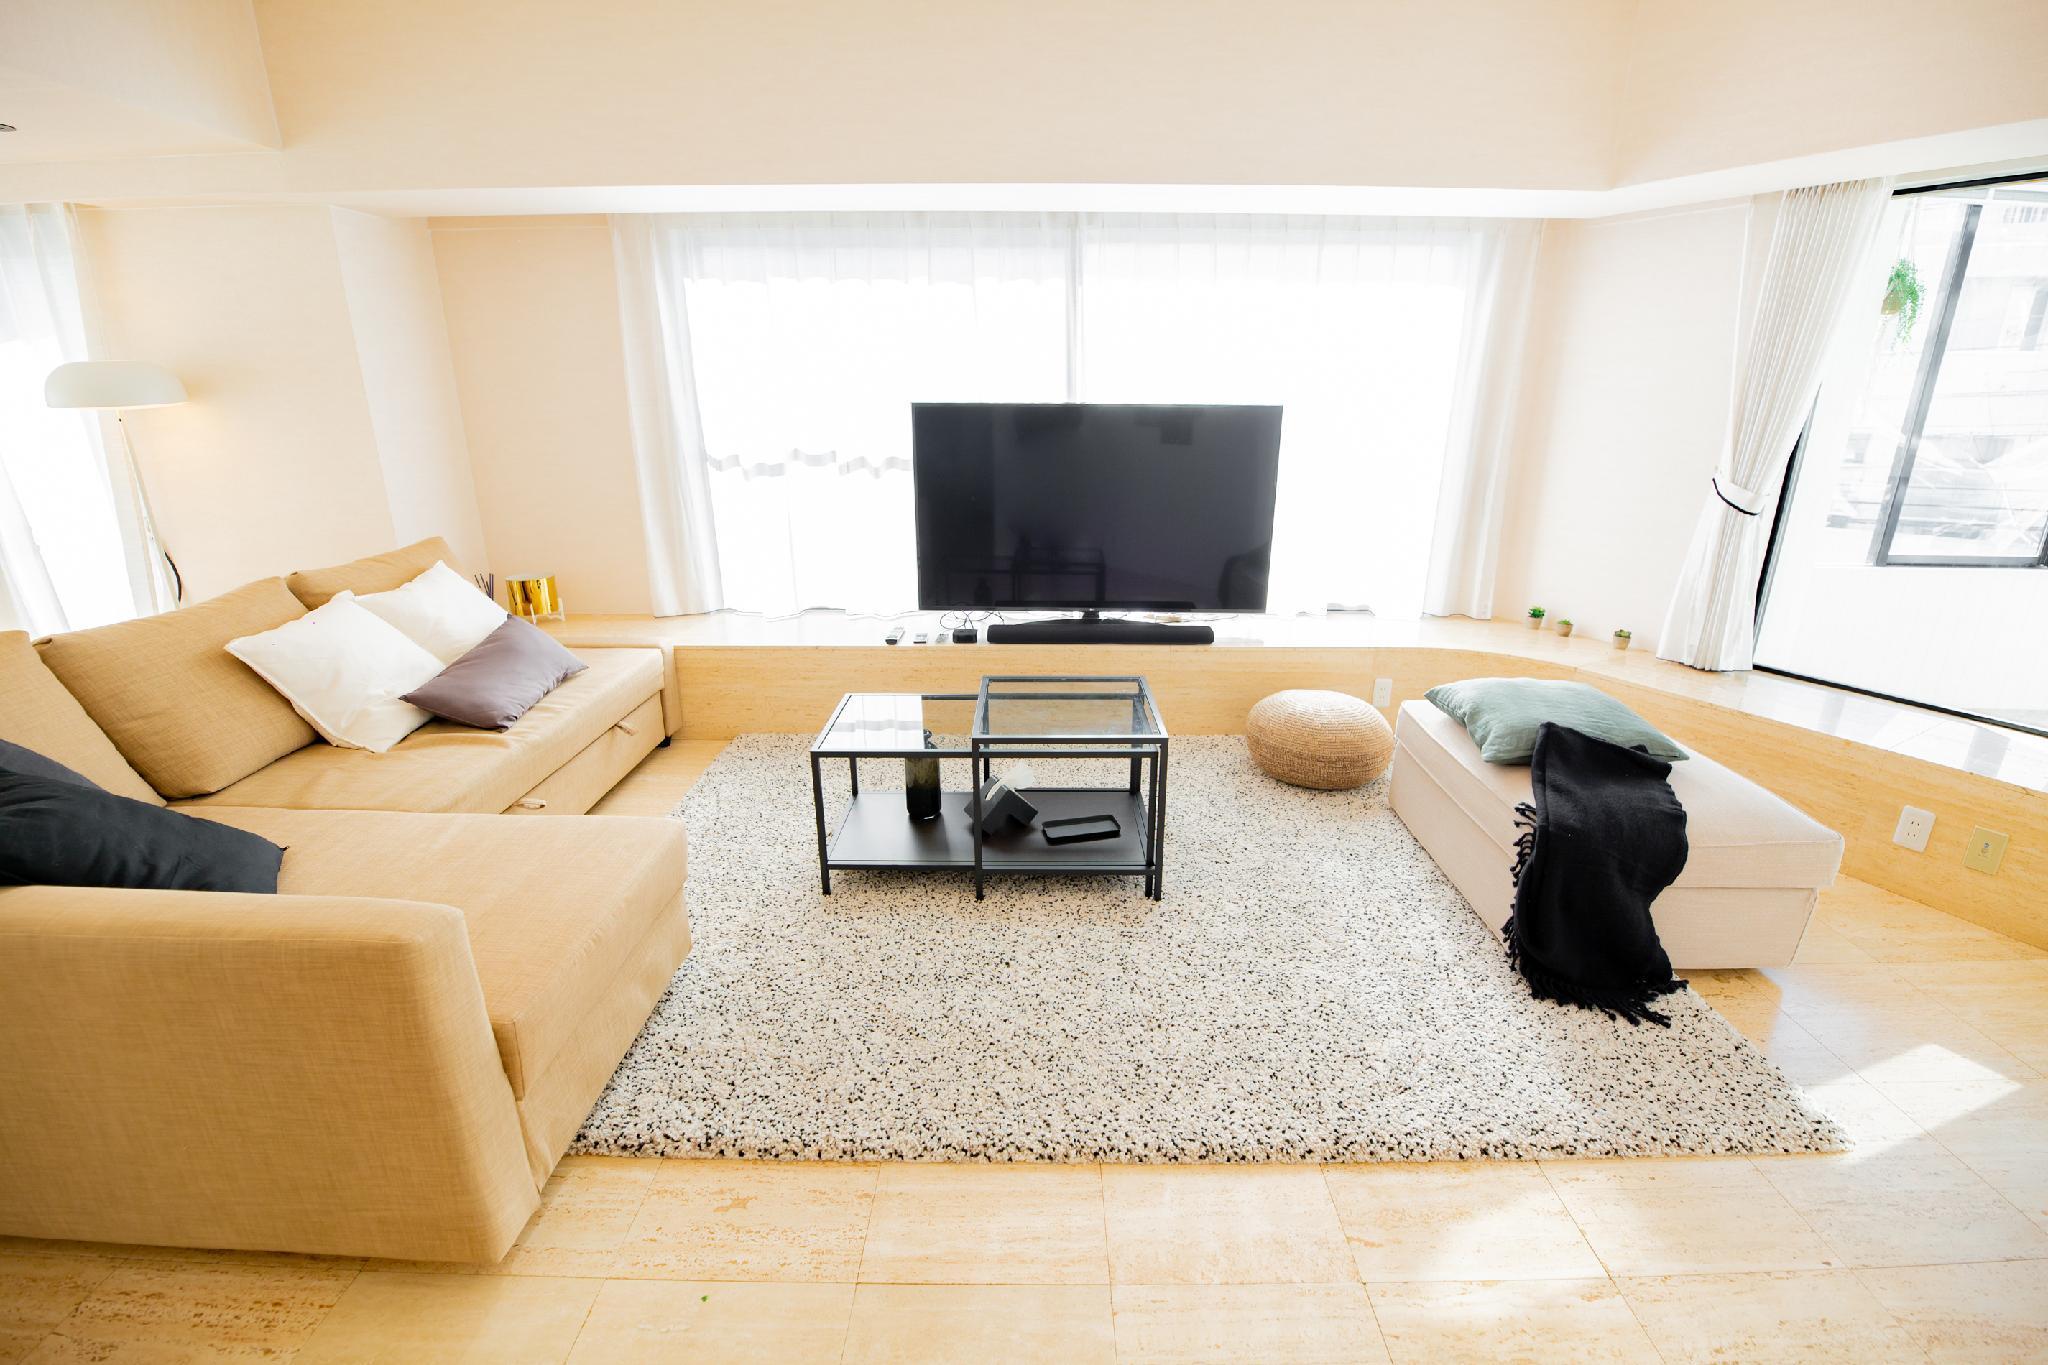 Shibuya Powell Palace 4 Story House 10min